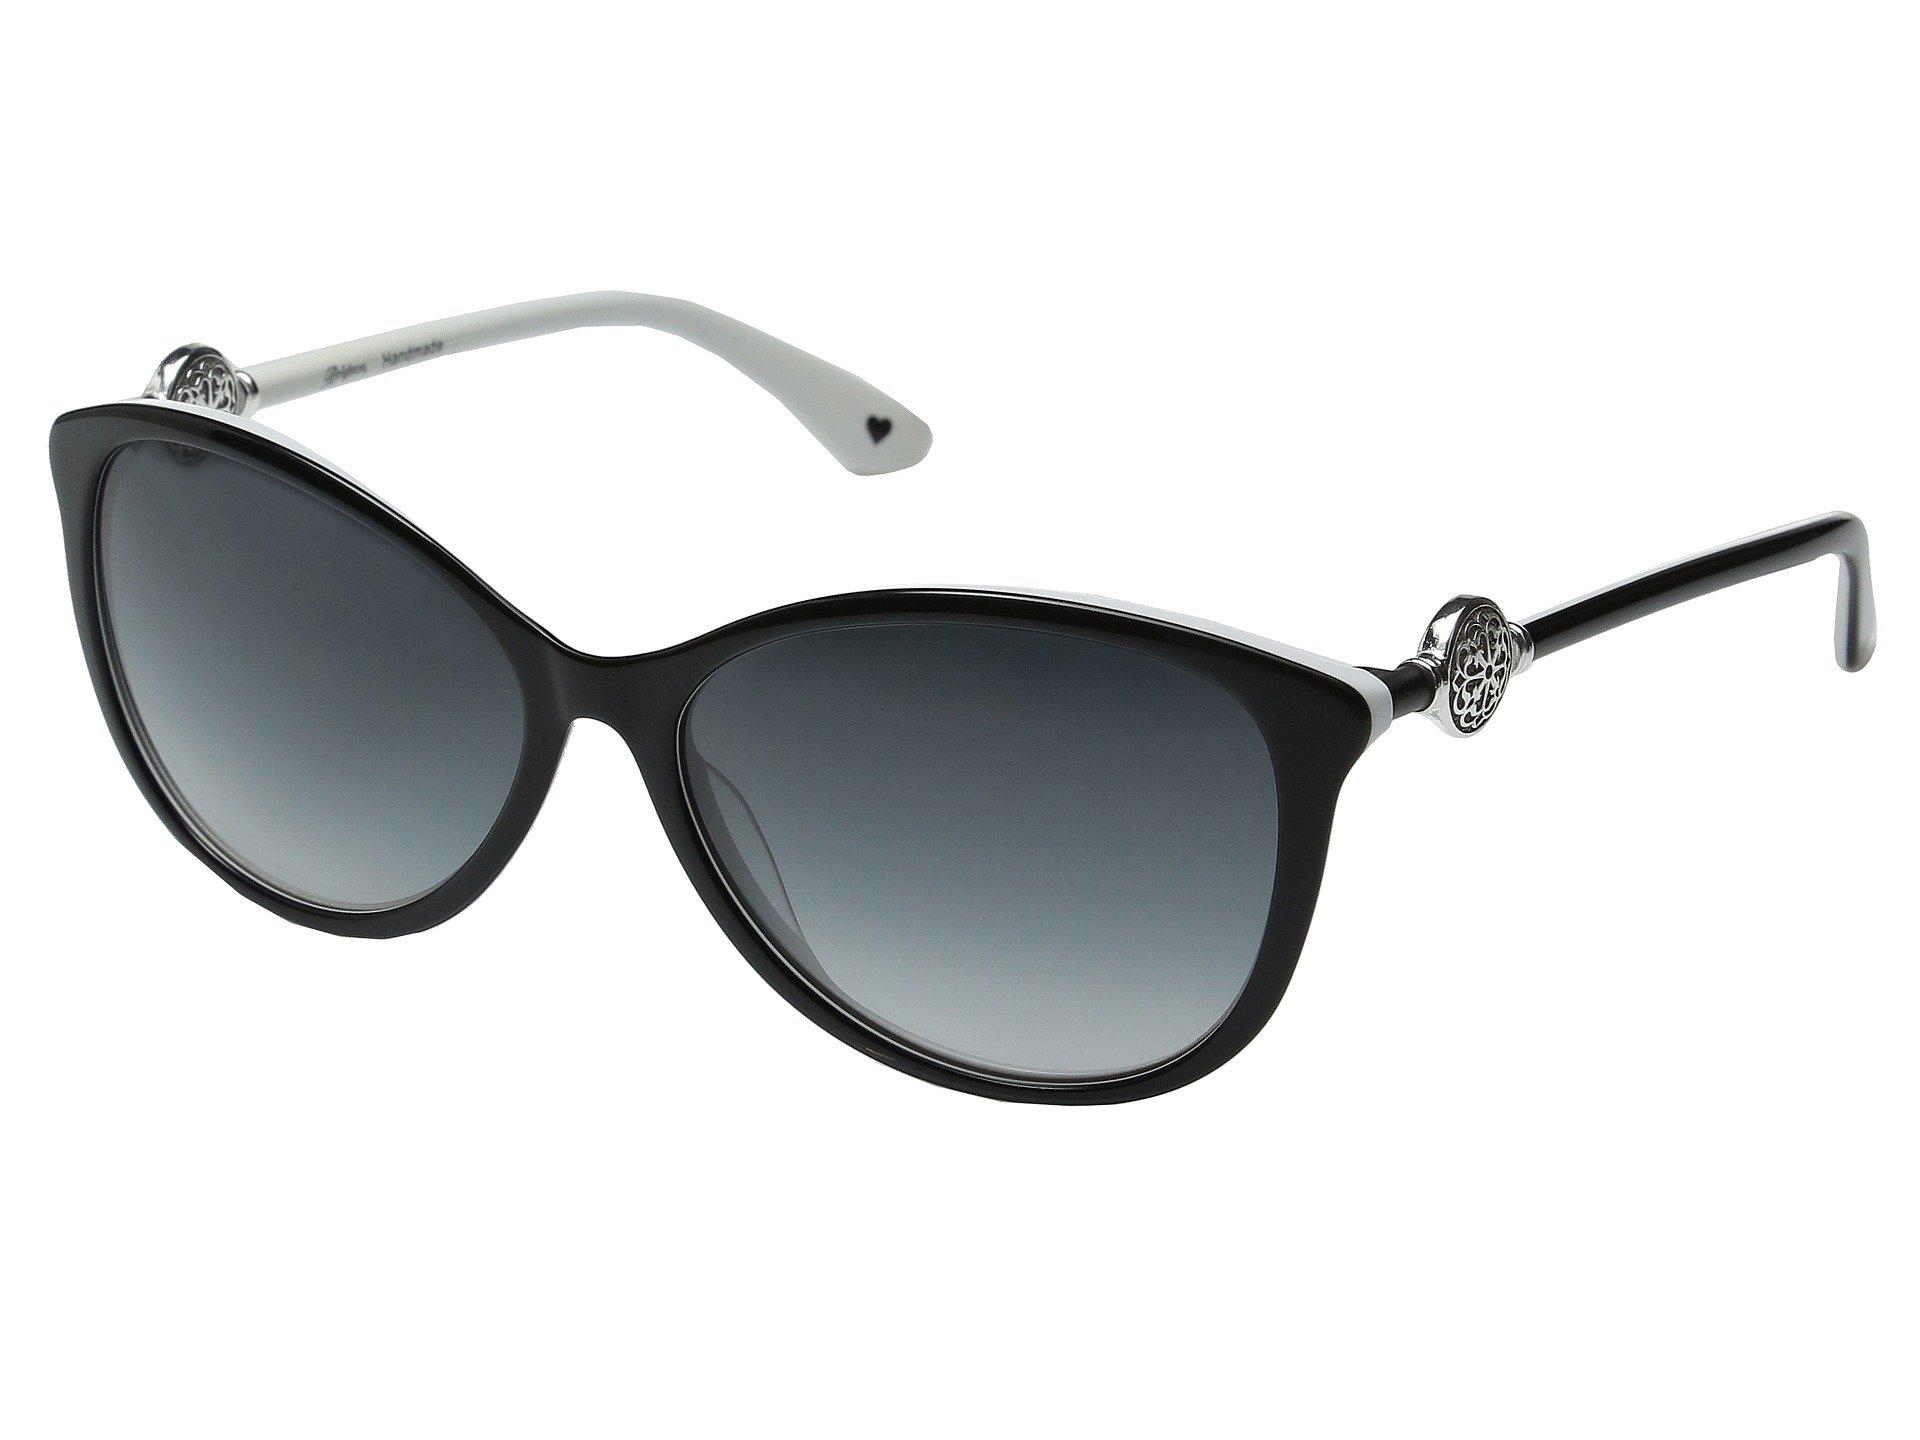 brighton sunglasses free shipping eyewear zappos com